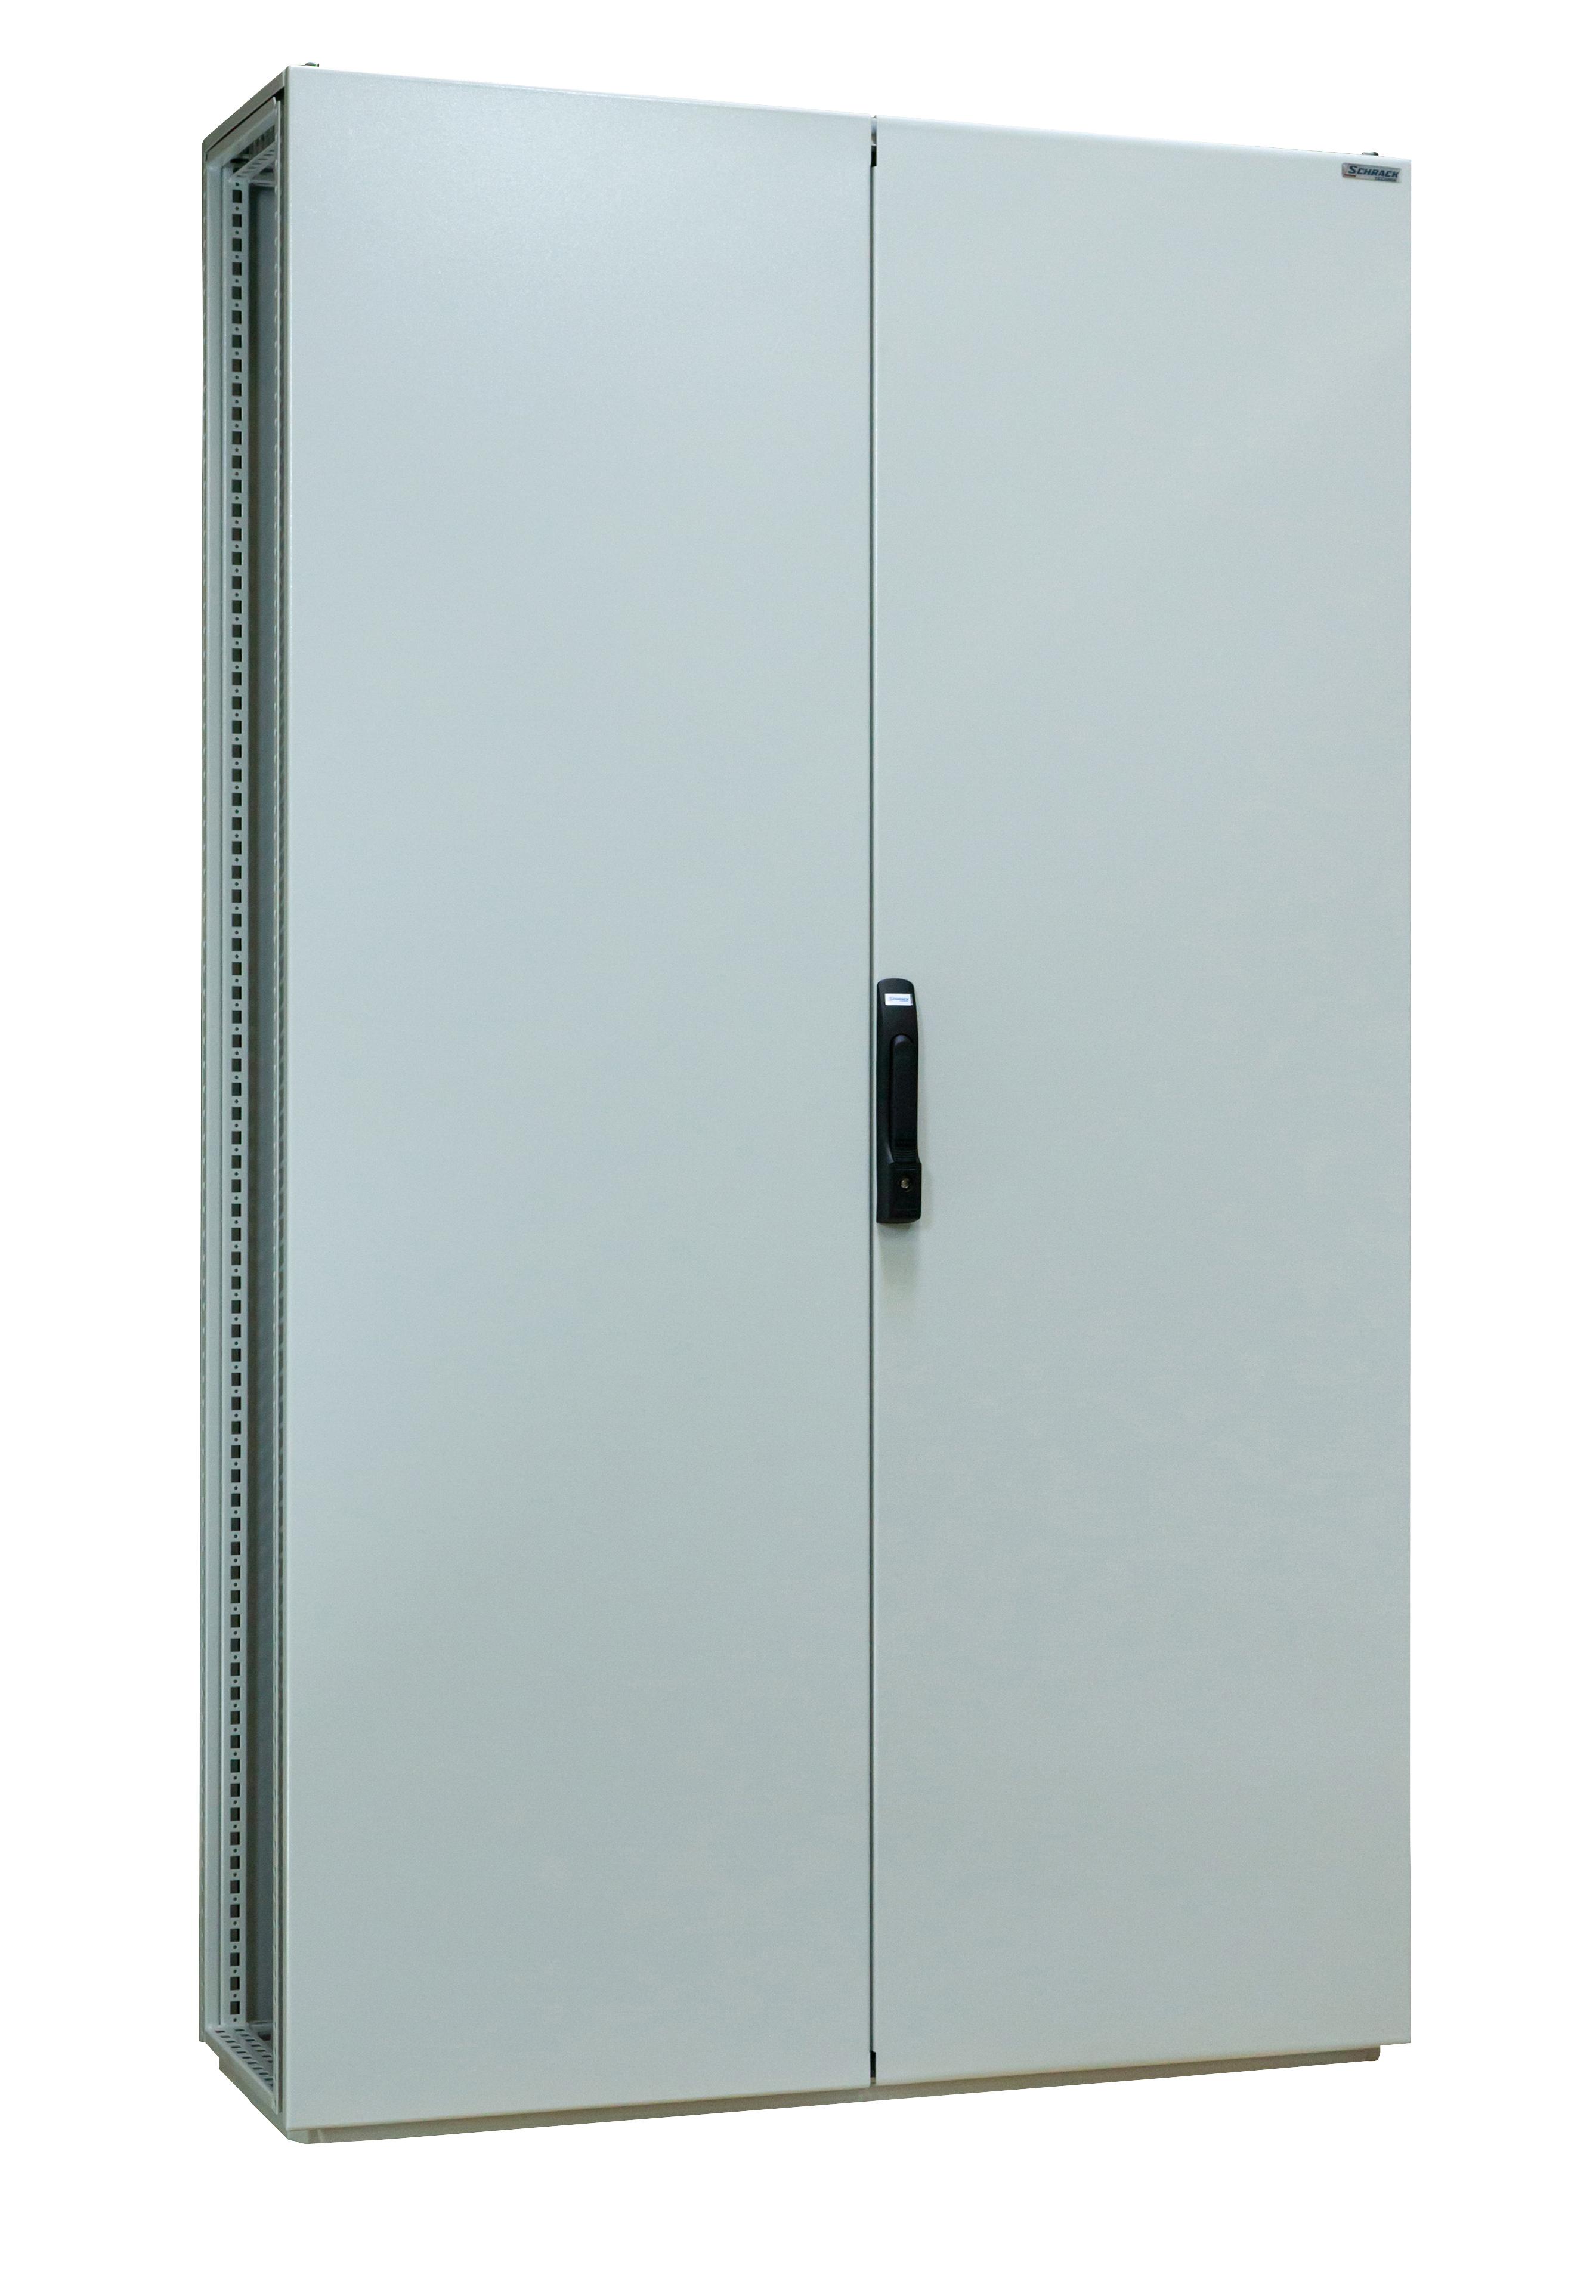 1 Stk Anreihschrank 2-türig, 1800x1200x400mm, RAL 7035 AS181242-5